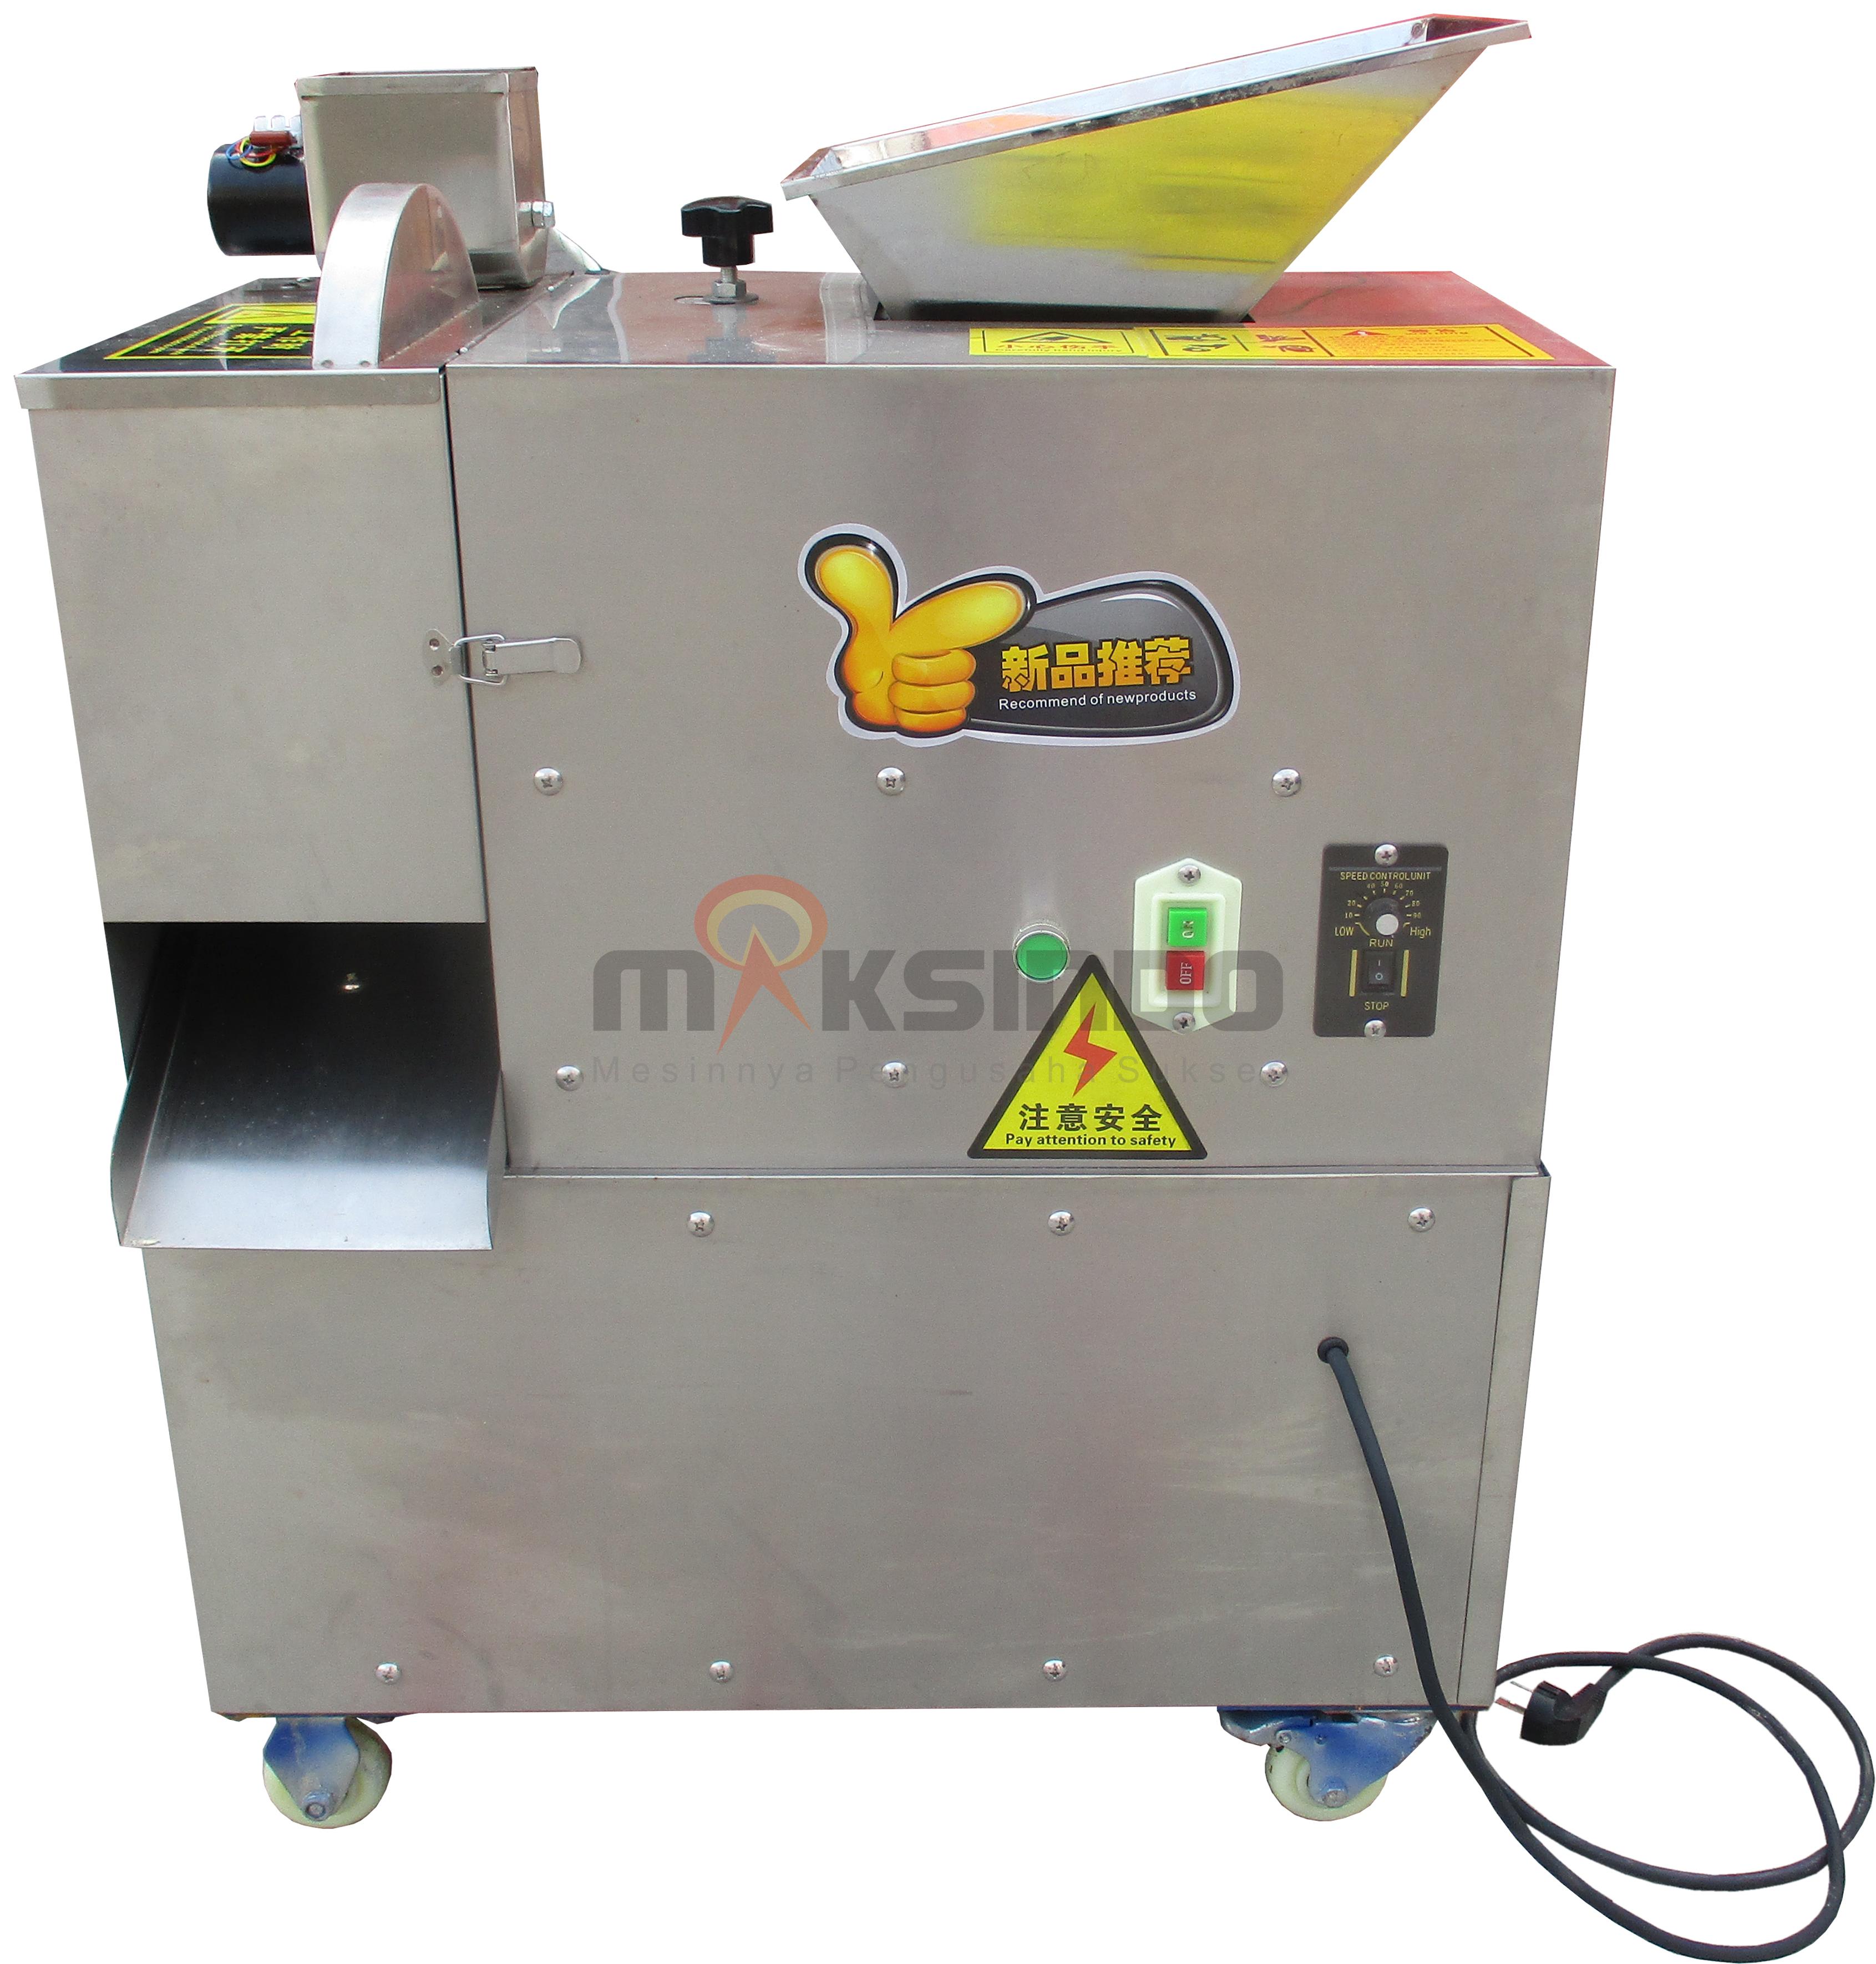 Jual Mesin Pembagi Adonan 4-230 gr (Dough Cutter) di Makassar